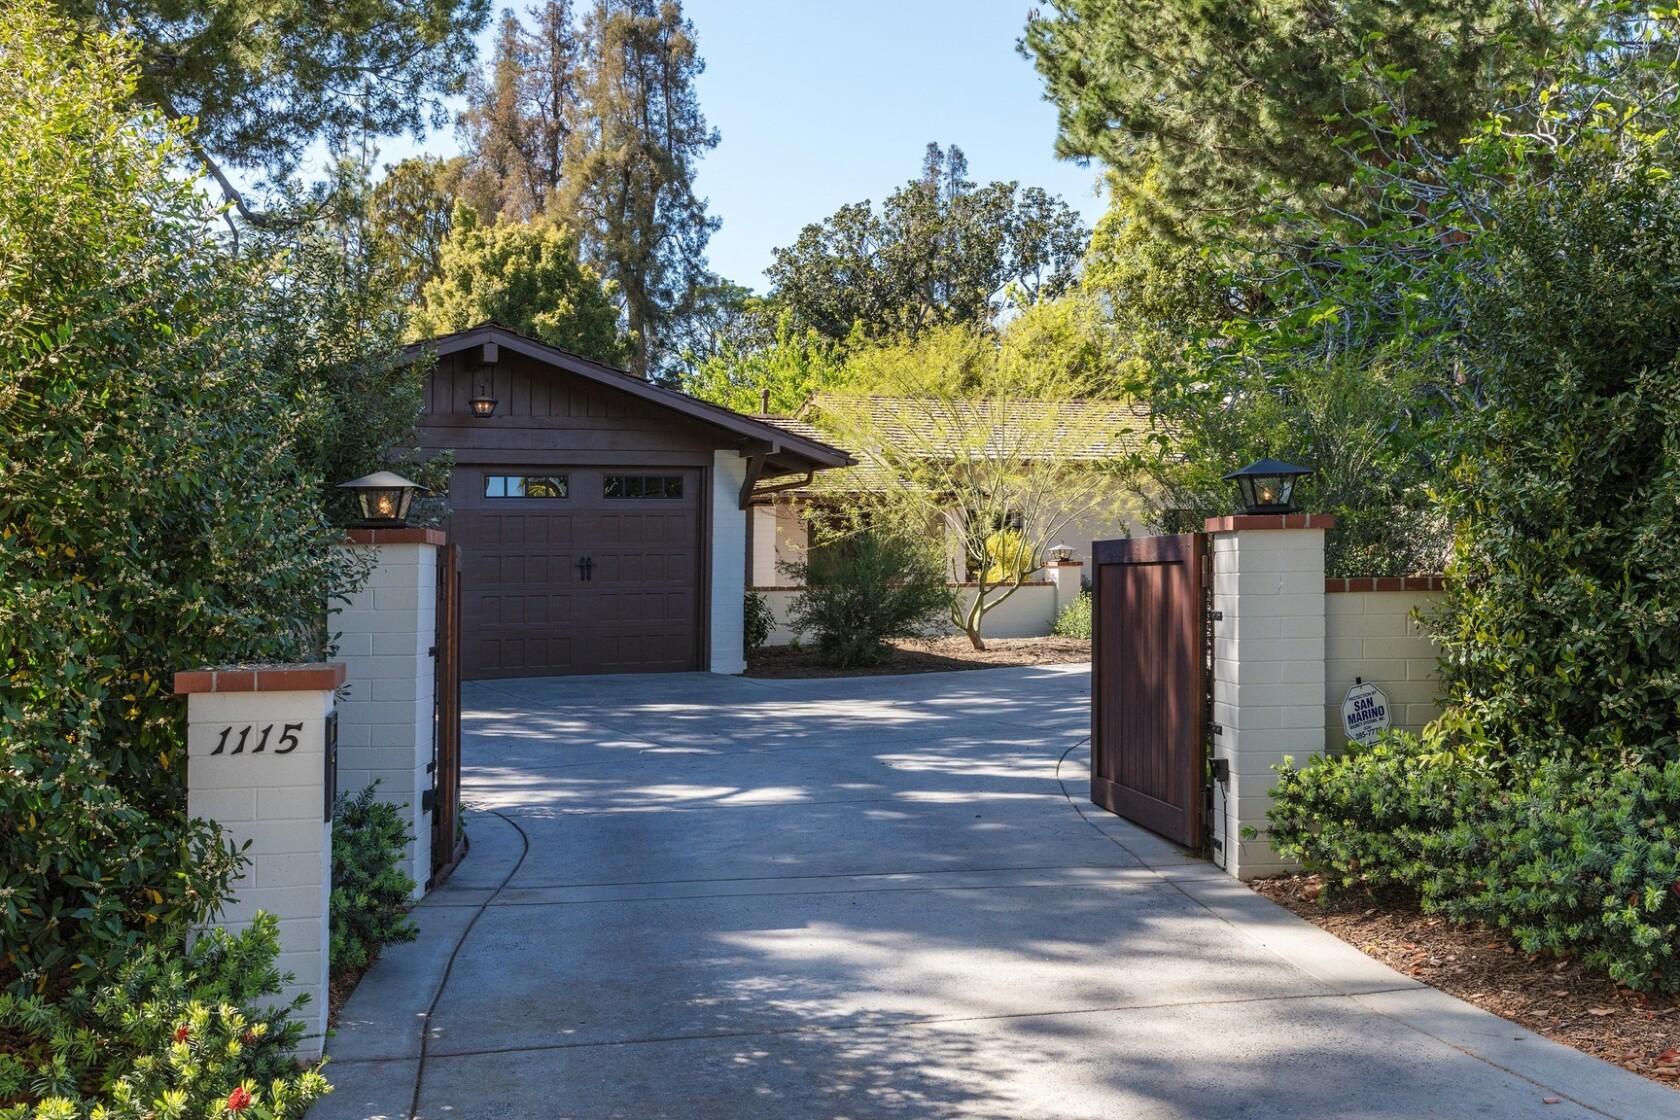 Pasadena hacienda built by Franklin Otis Booth Jr  seeks $3